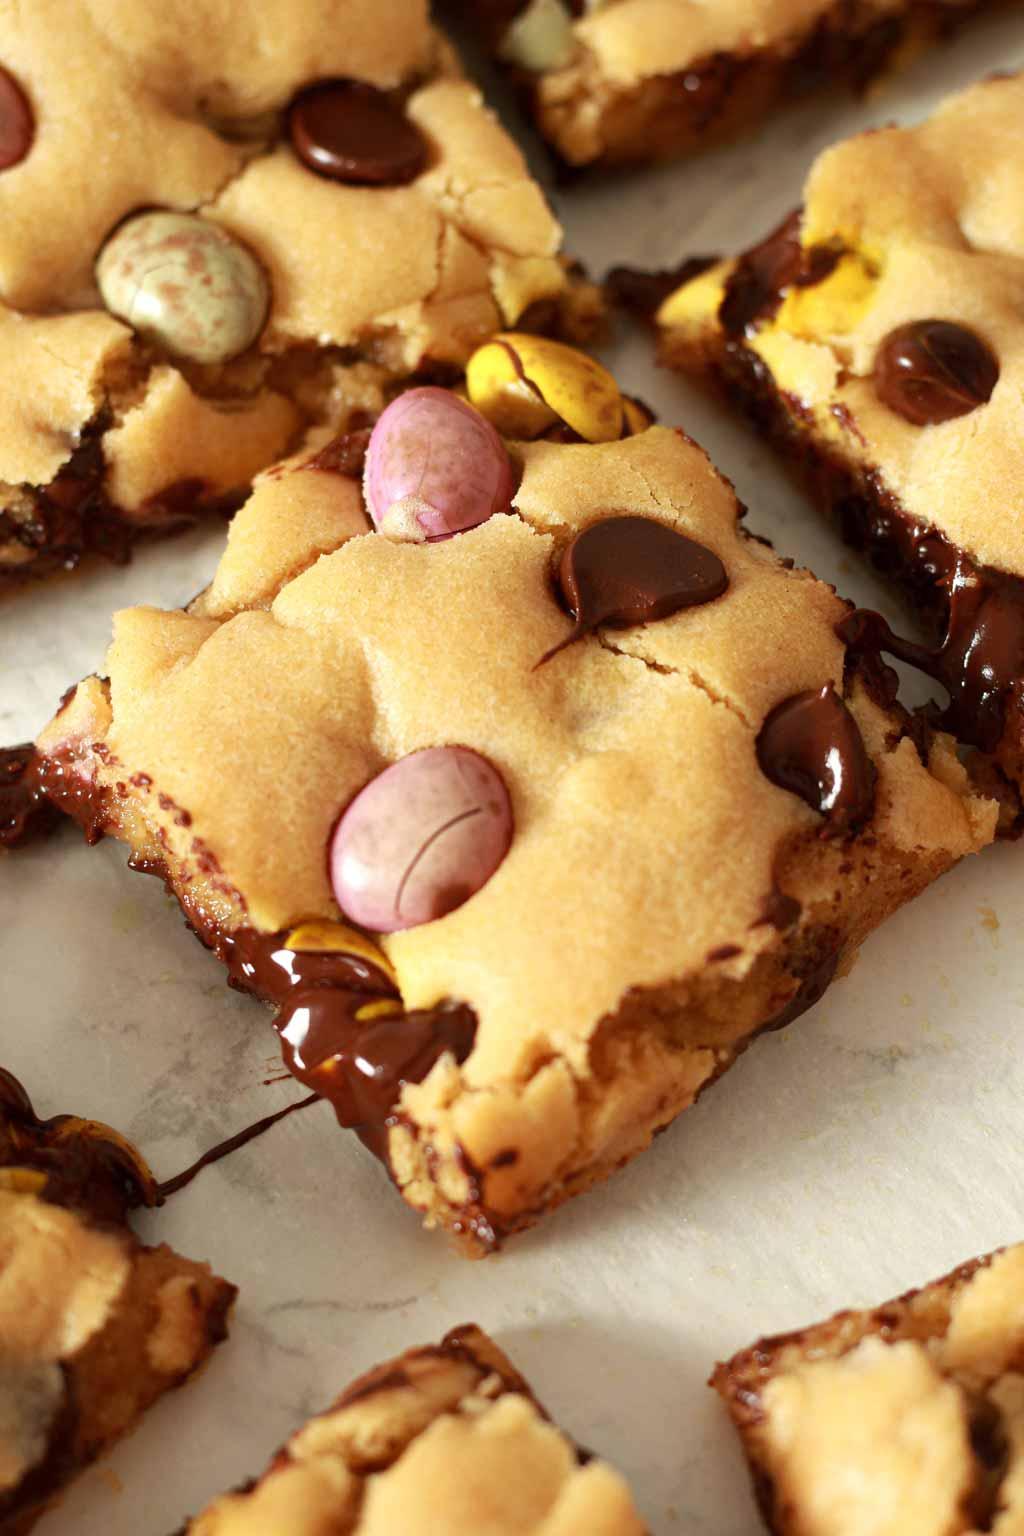 Gooey Squares Of Cookie